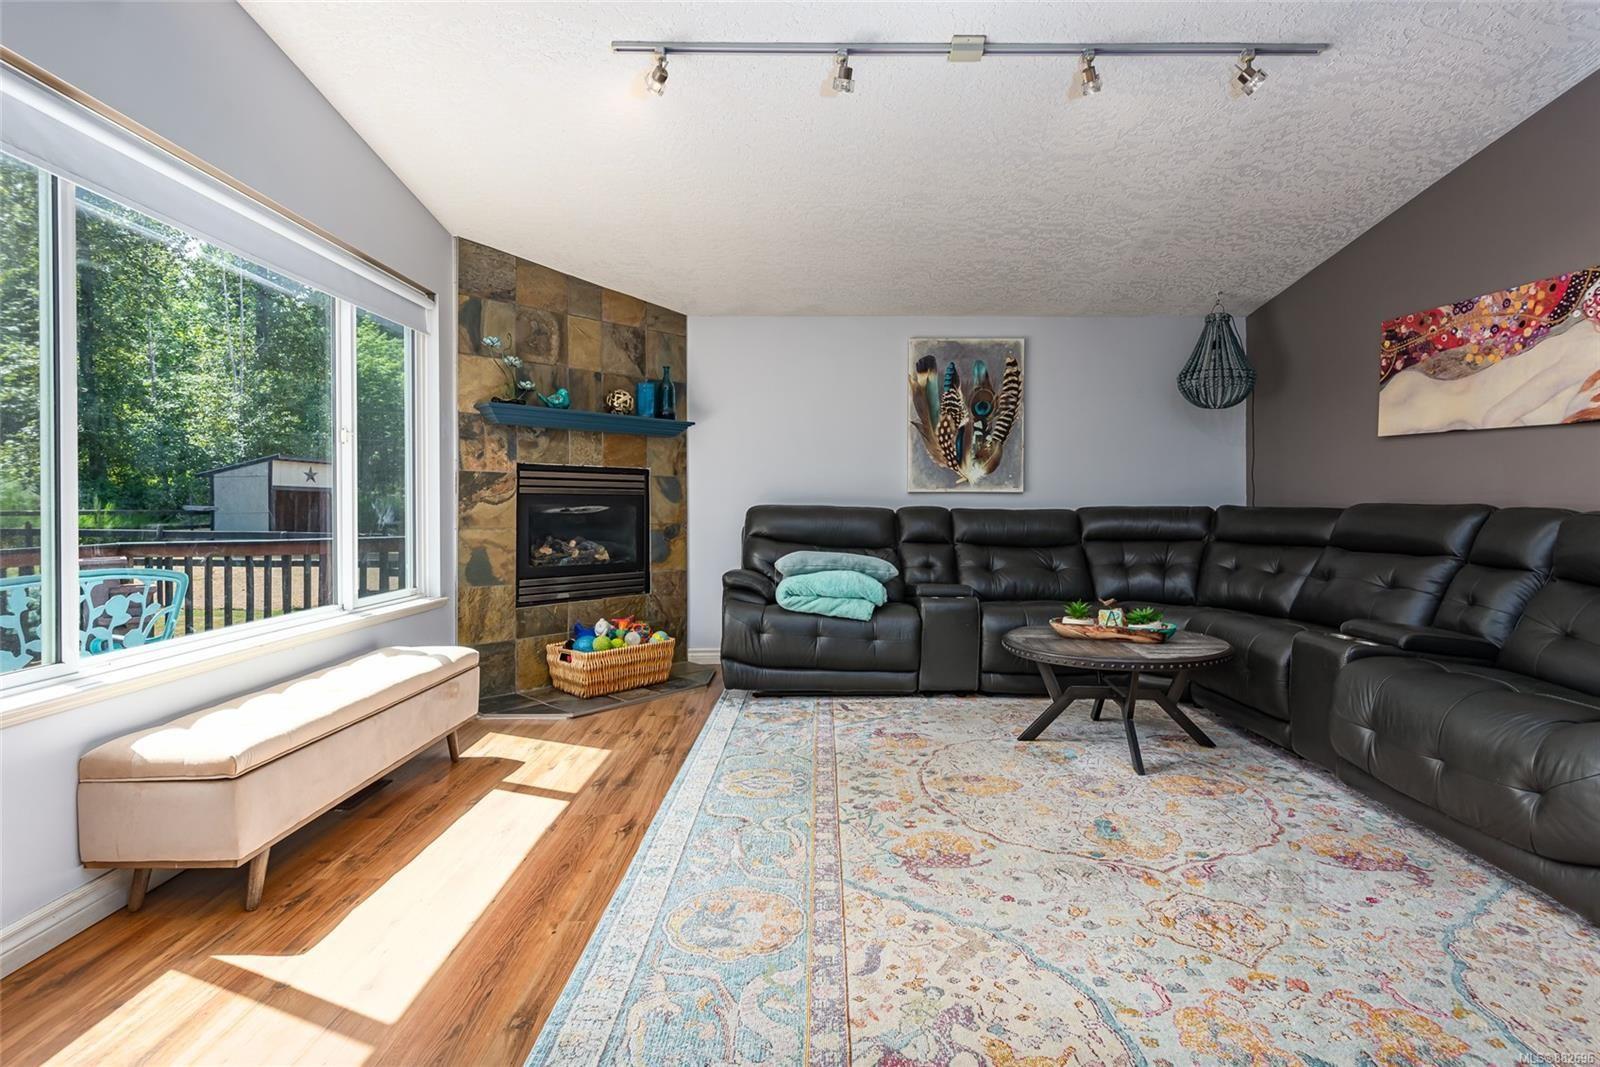 Photo 9: Photos: 3554 MacAulay Rd in : CV Merville Black Creek House for sale (Comox Valley)  : MLS®# 882696